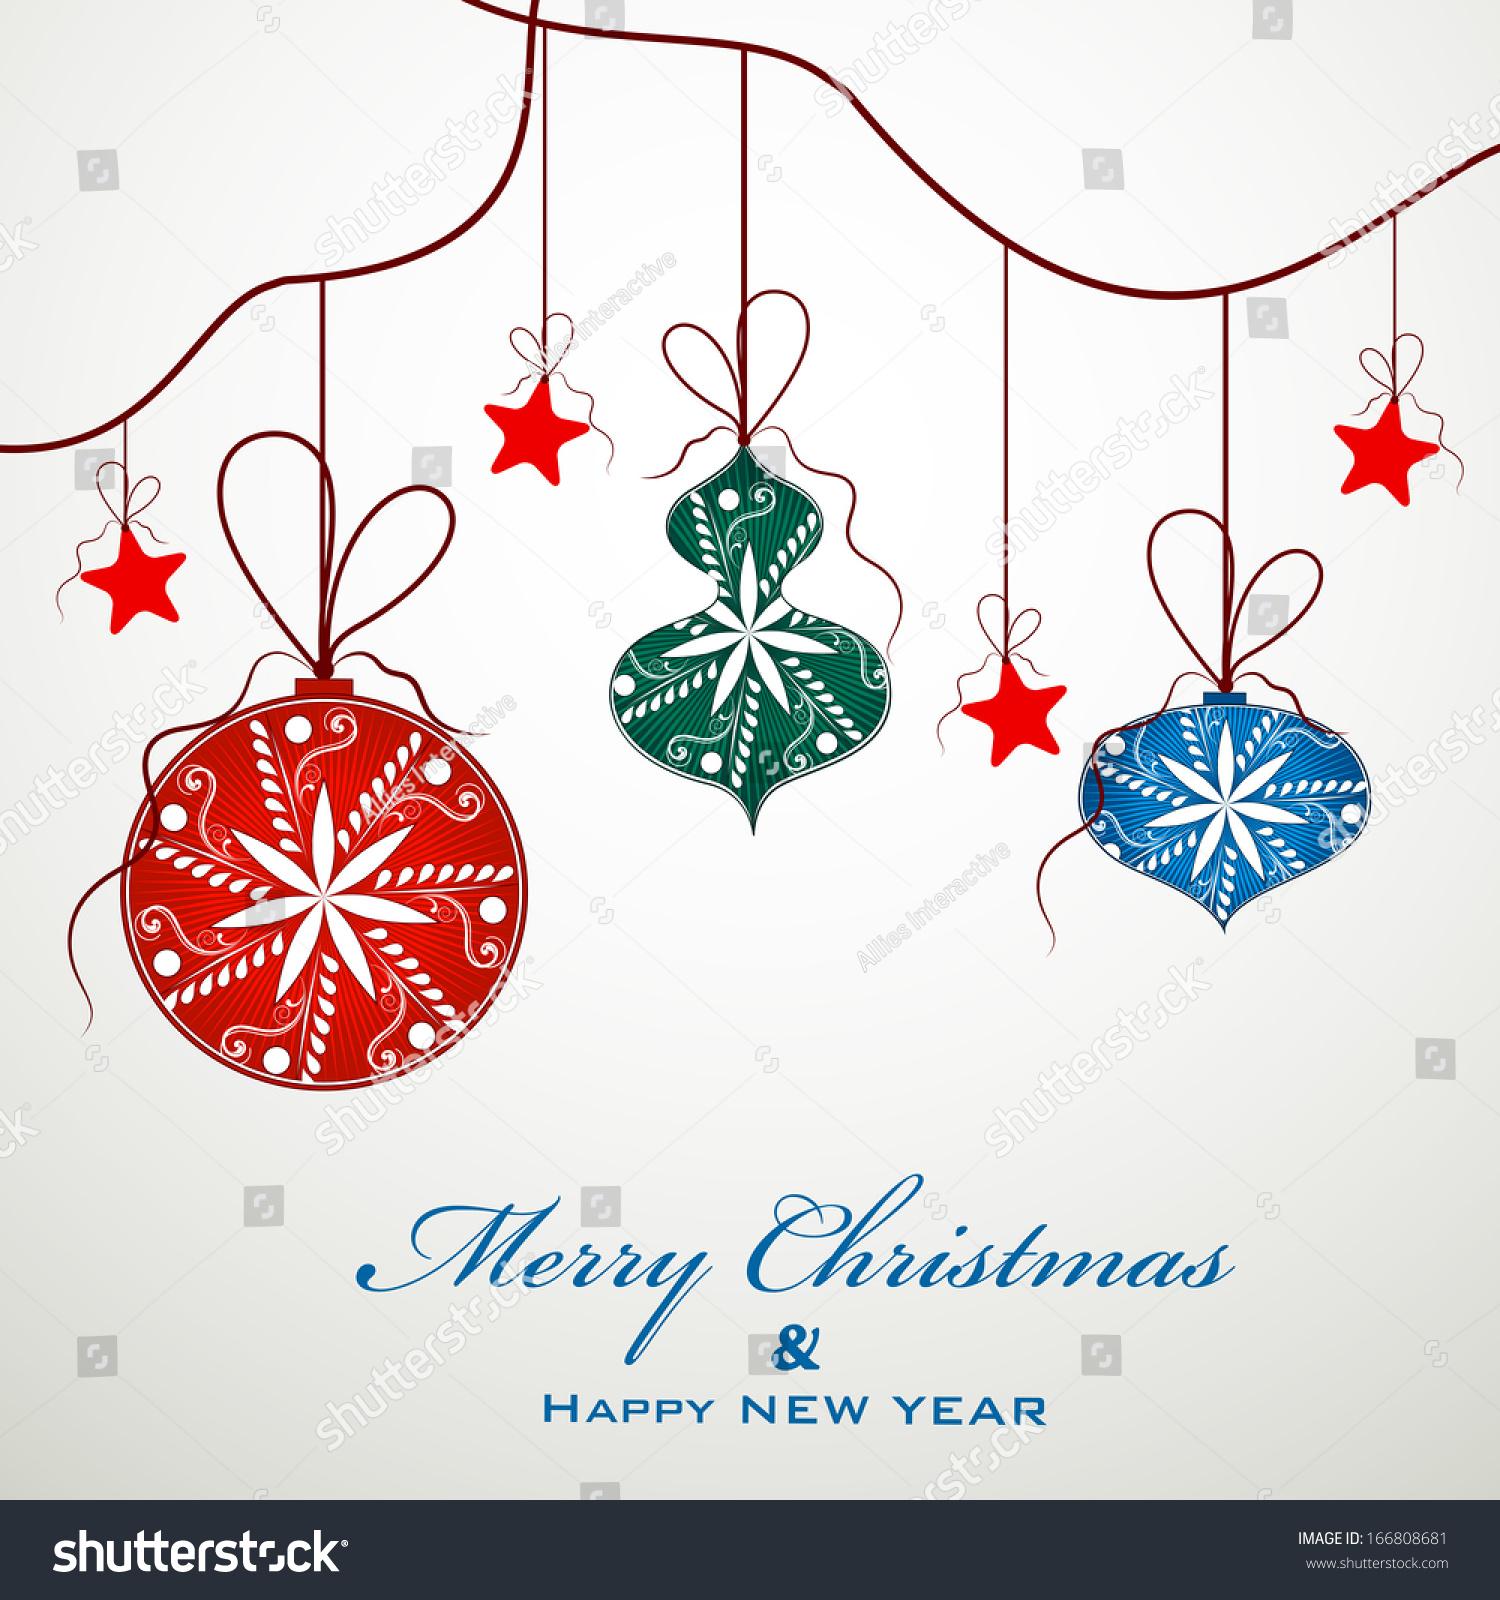 Merry christmas celebration greeting card invitation stock photo merry christmas celebration greeting card or invitation card with hanging colorful xmas balls on grey background stopboris Image collections